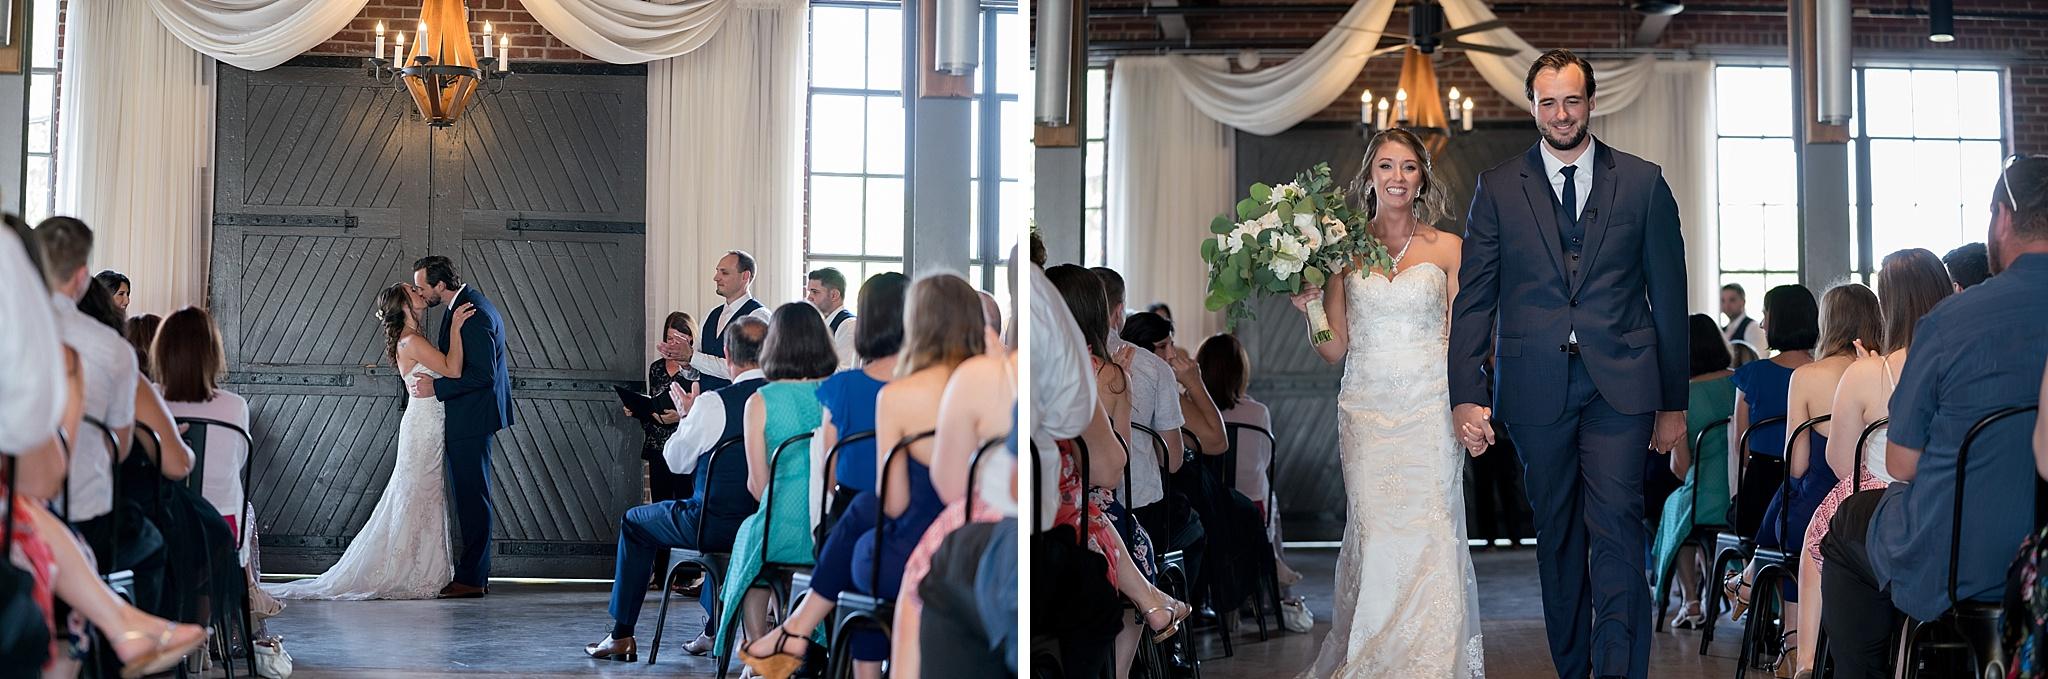 Rickhouse-Durham-NC-Wedding-Photographer-047.jpg